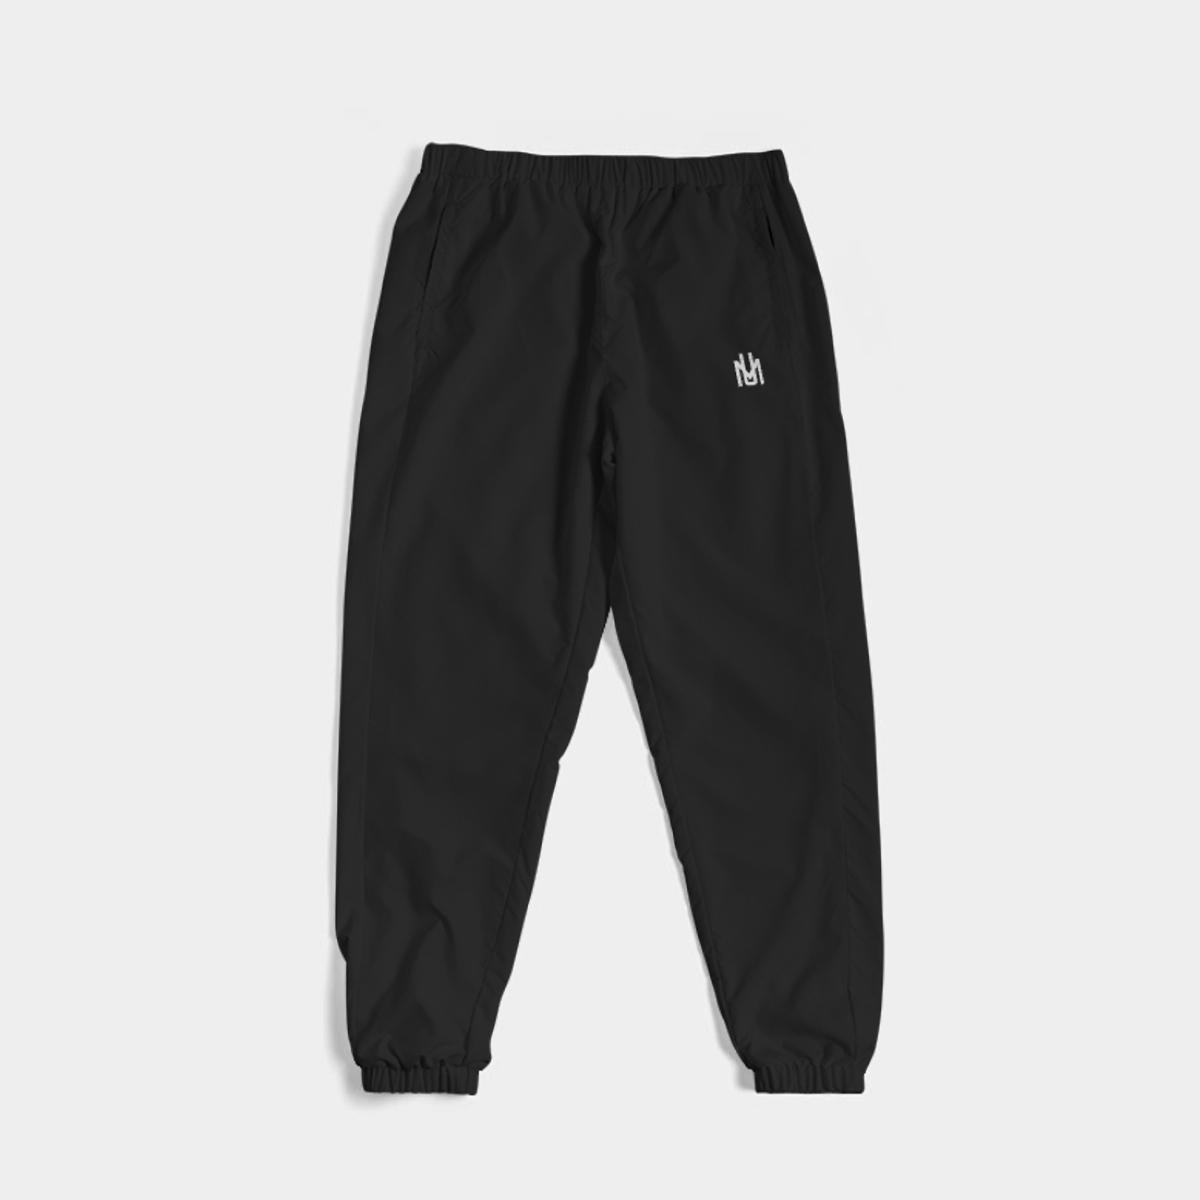 MÜV Essentials Track Pants